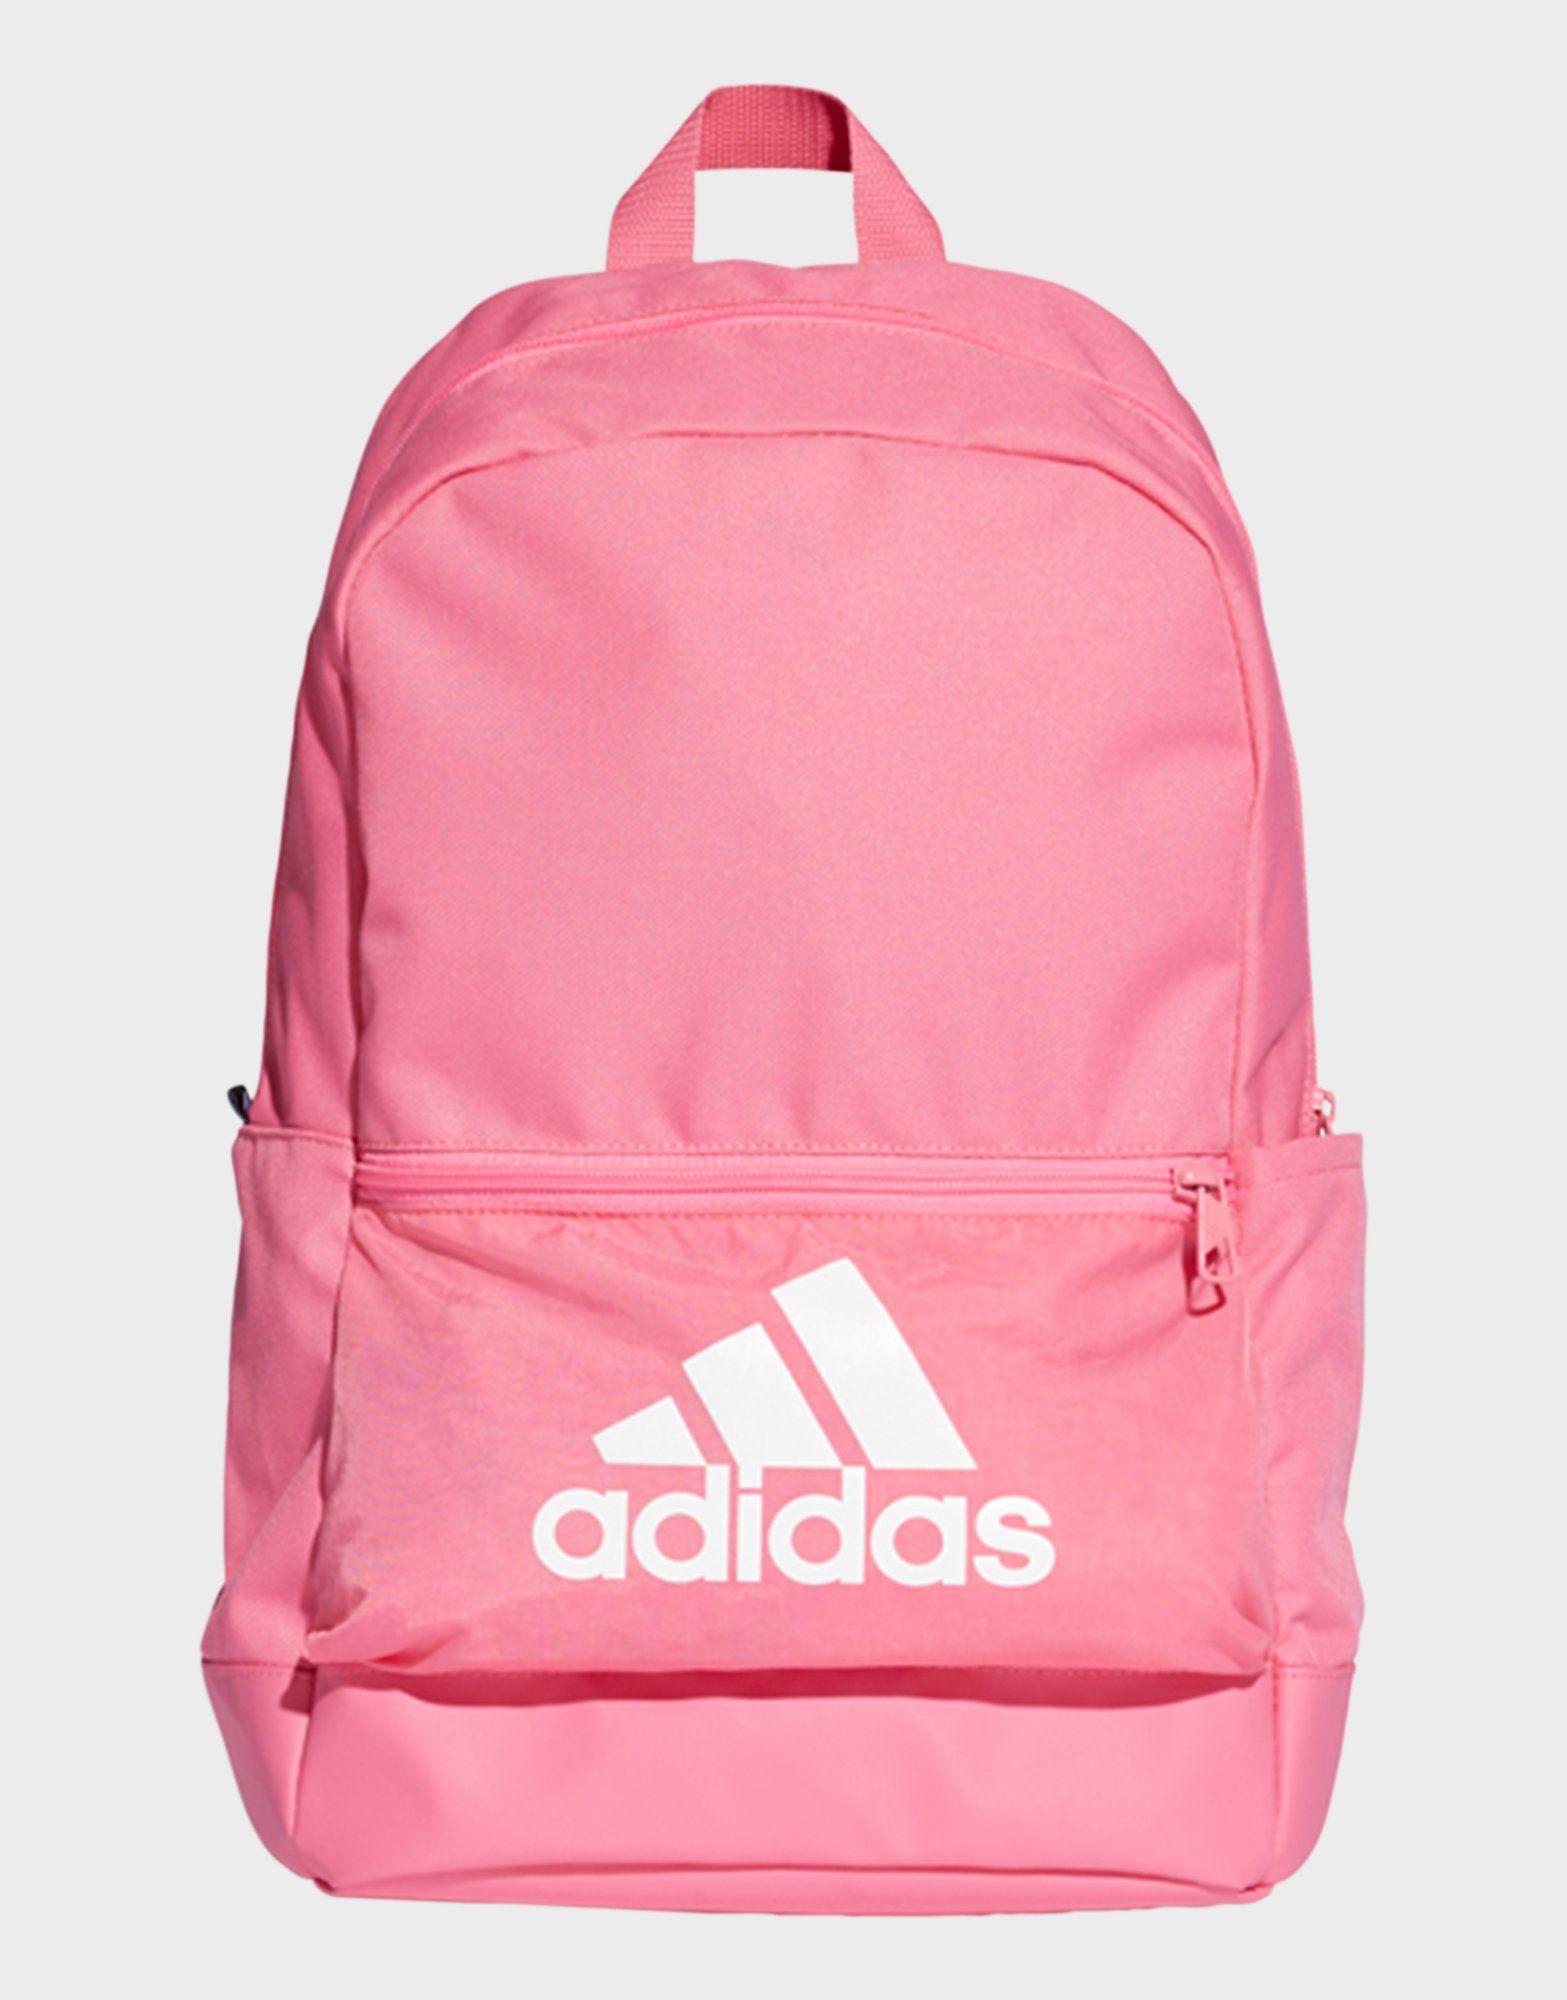 b5f629f706 Adidas School Bags Sports Direct | The Shred Centre